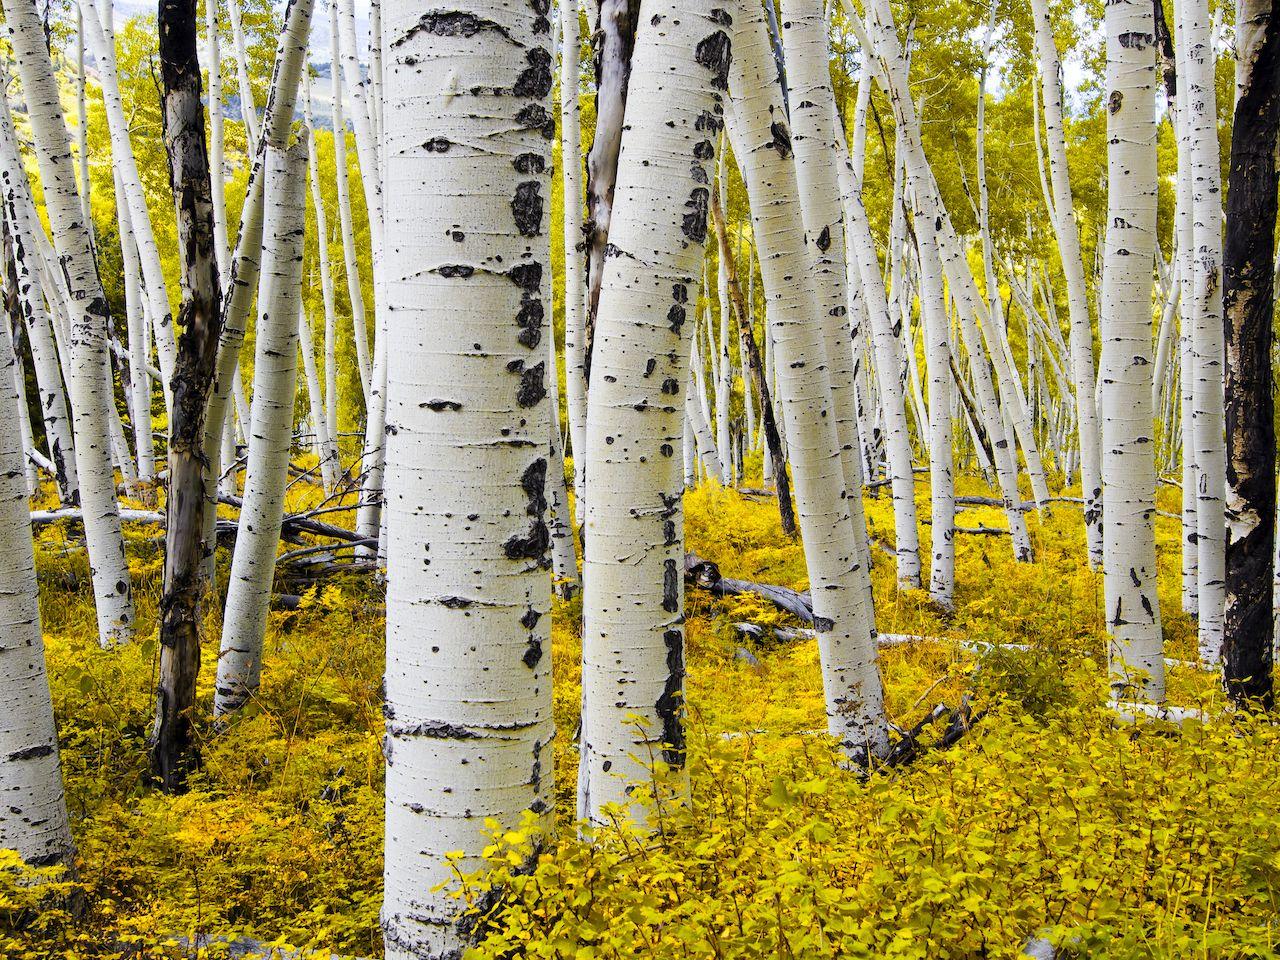 White aspen trees and their fall foliage in Aspen, Colorado